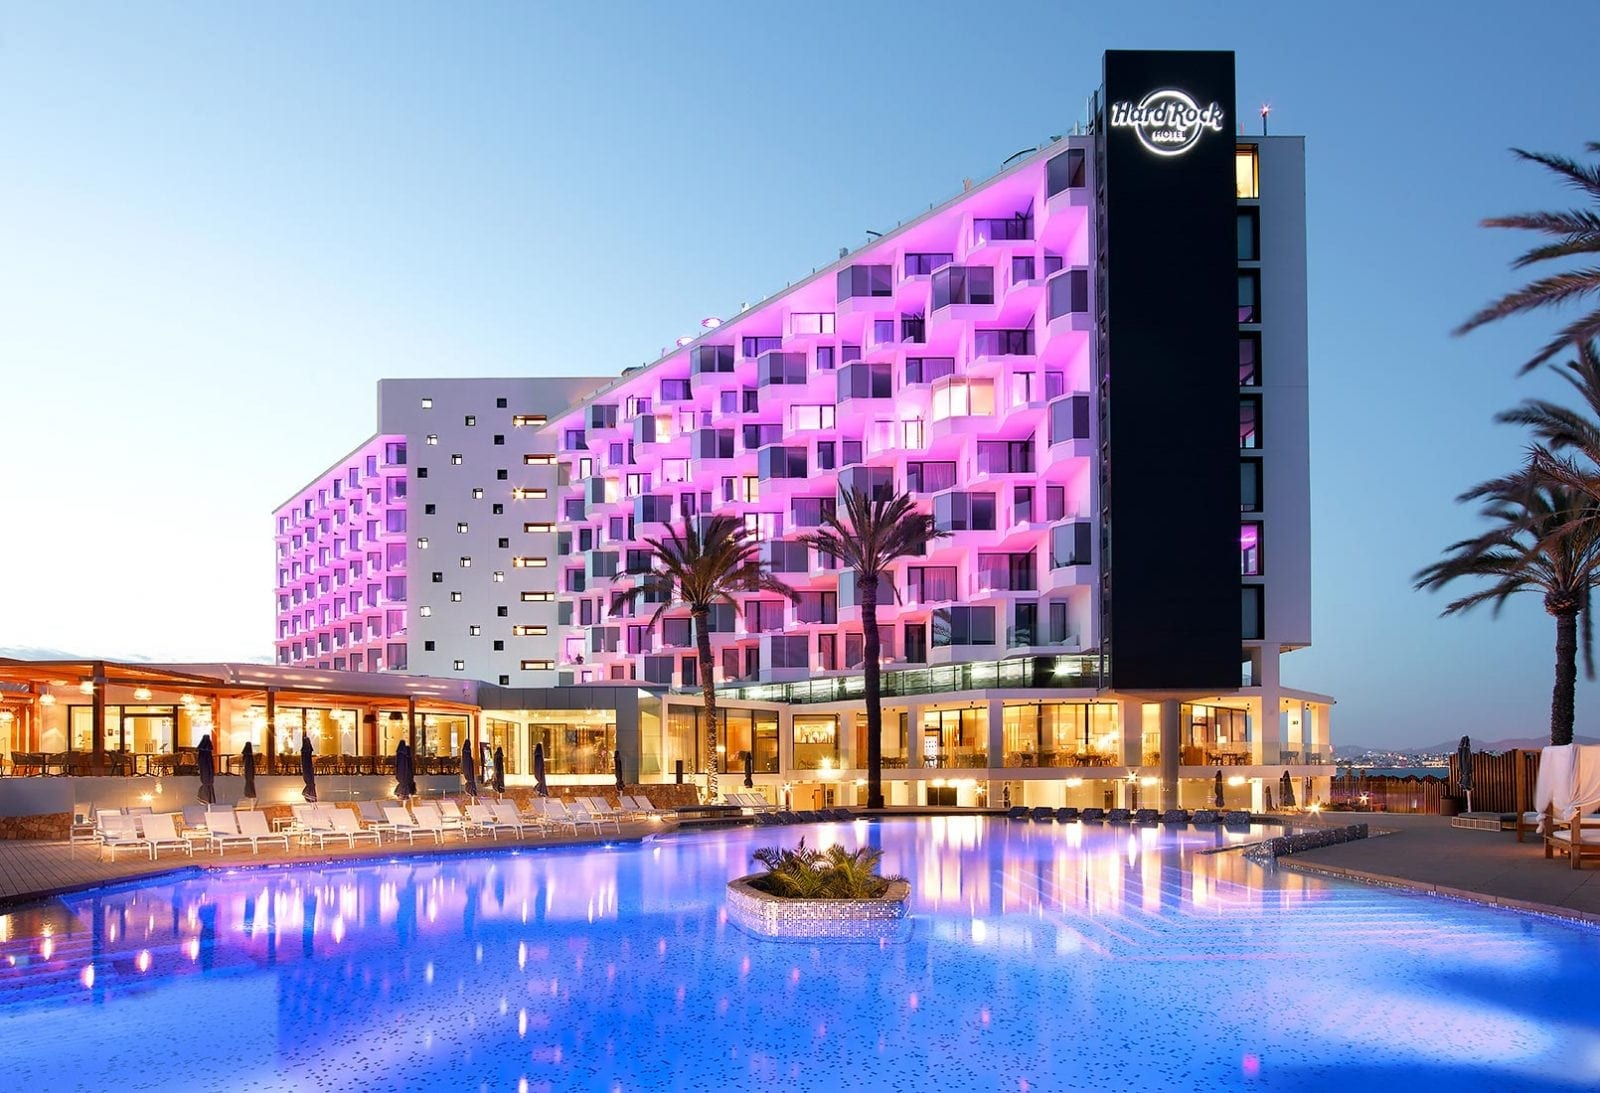 Eden Pool night - Hard Rock Ibiza - Vacanța europeană în ritm american hard rock